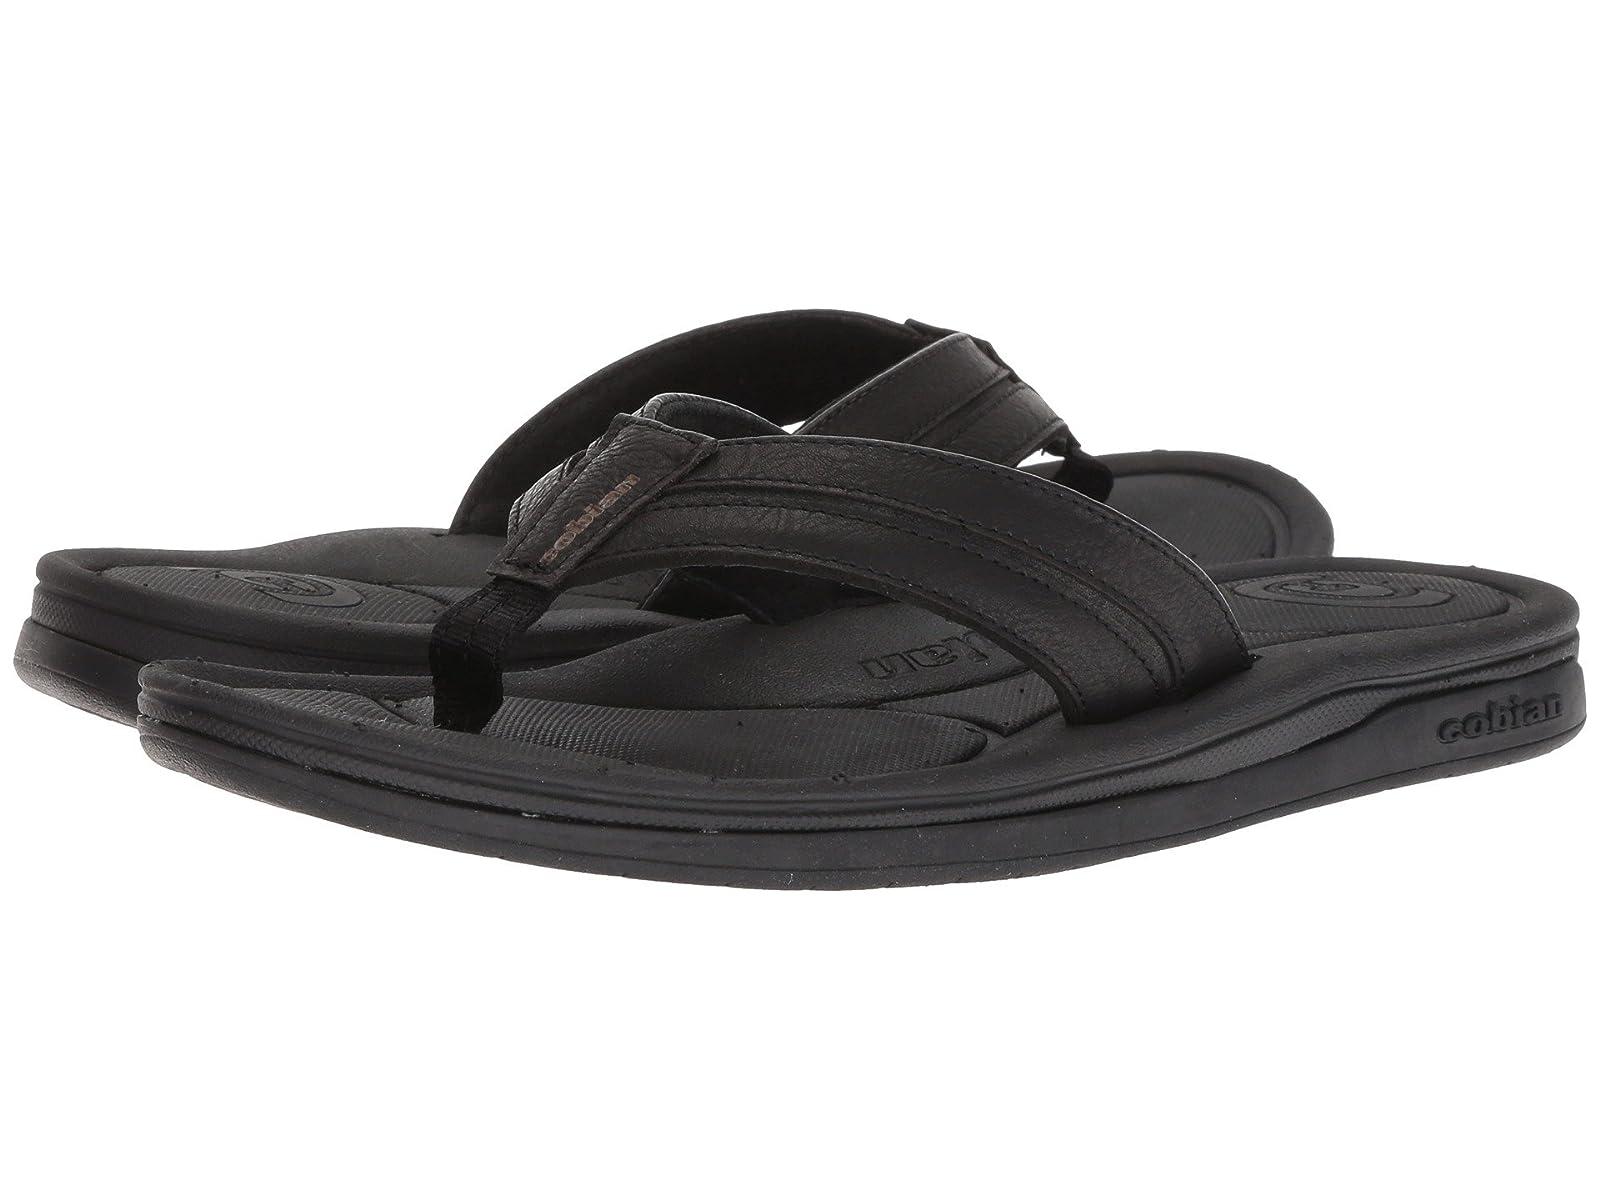 Cobian Tofino BolsterComfortable and distinctive shoes